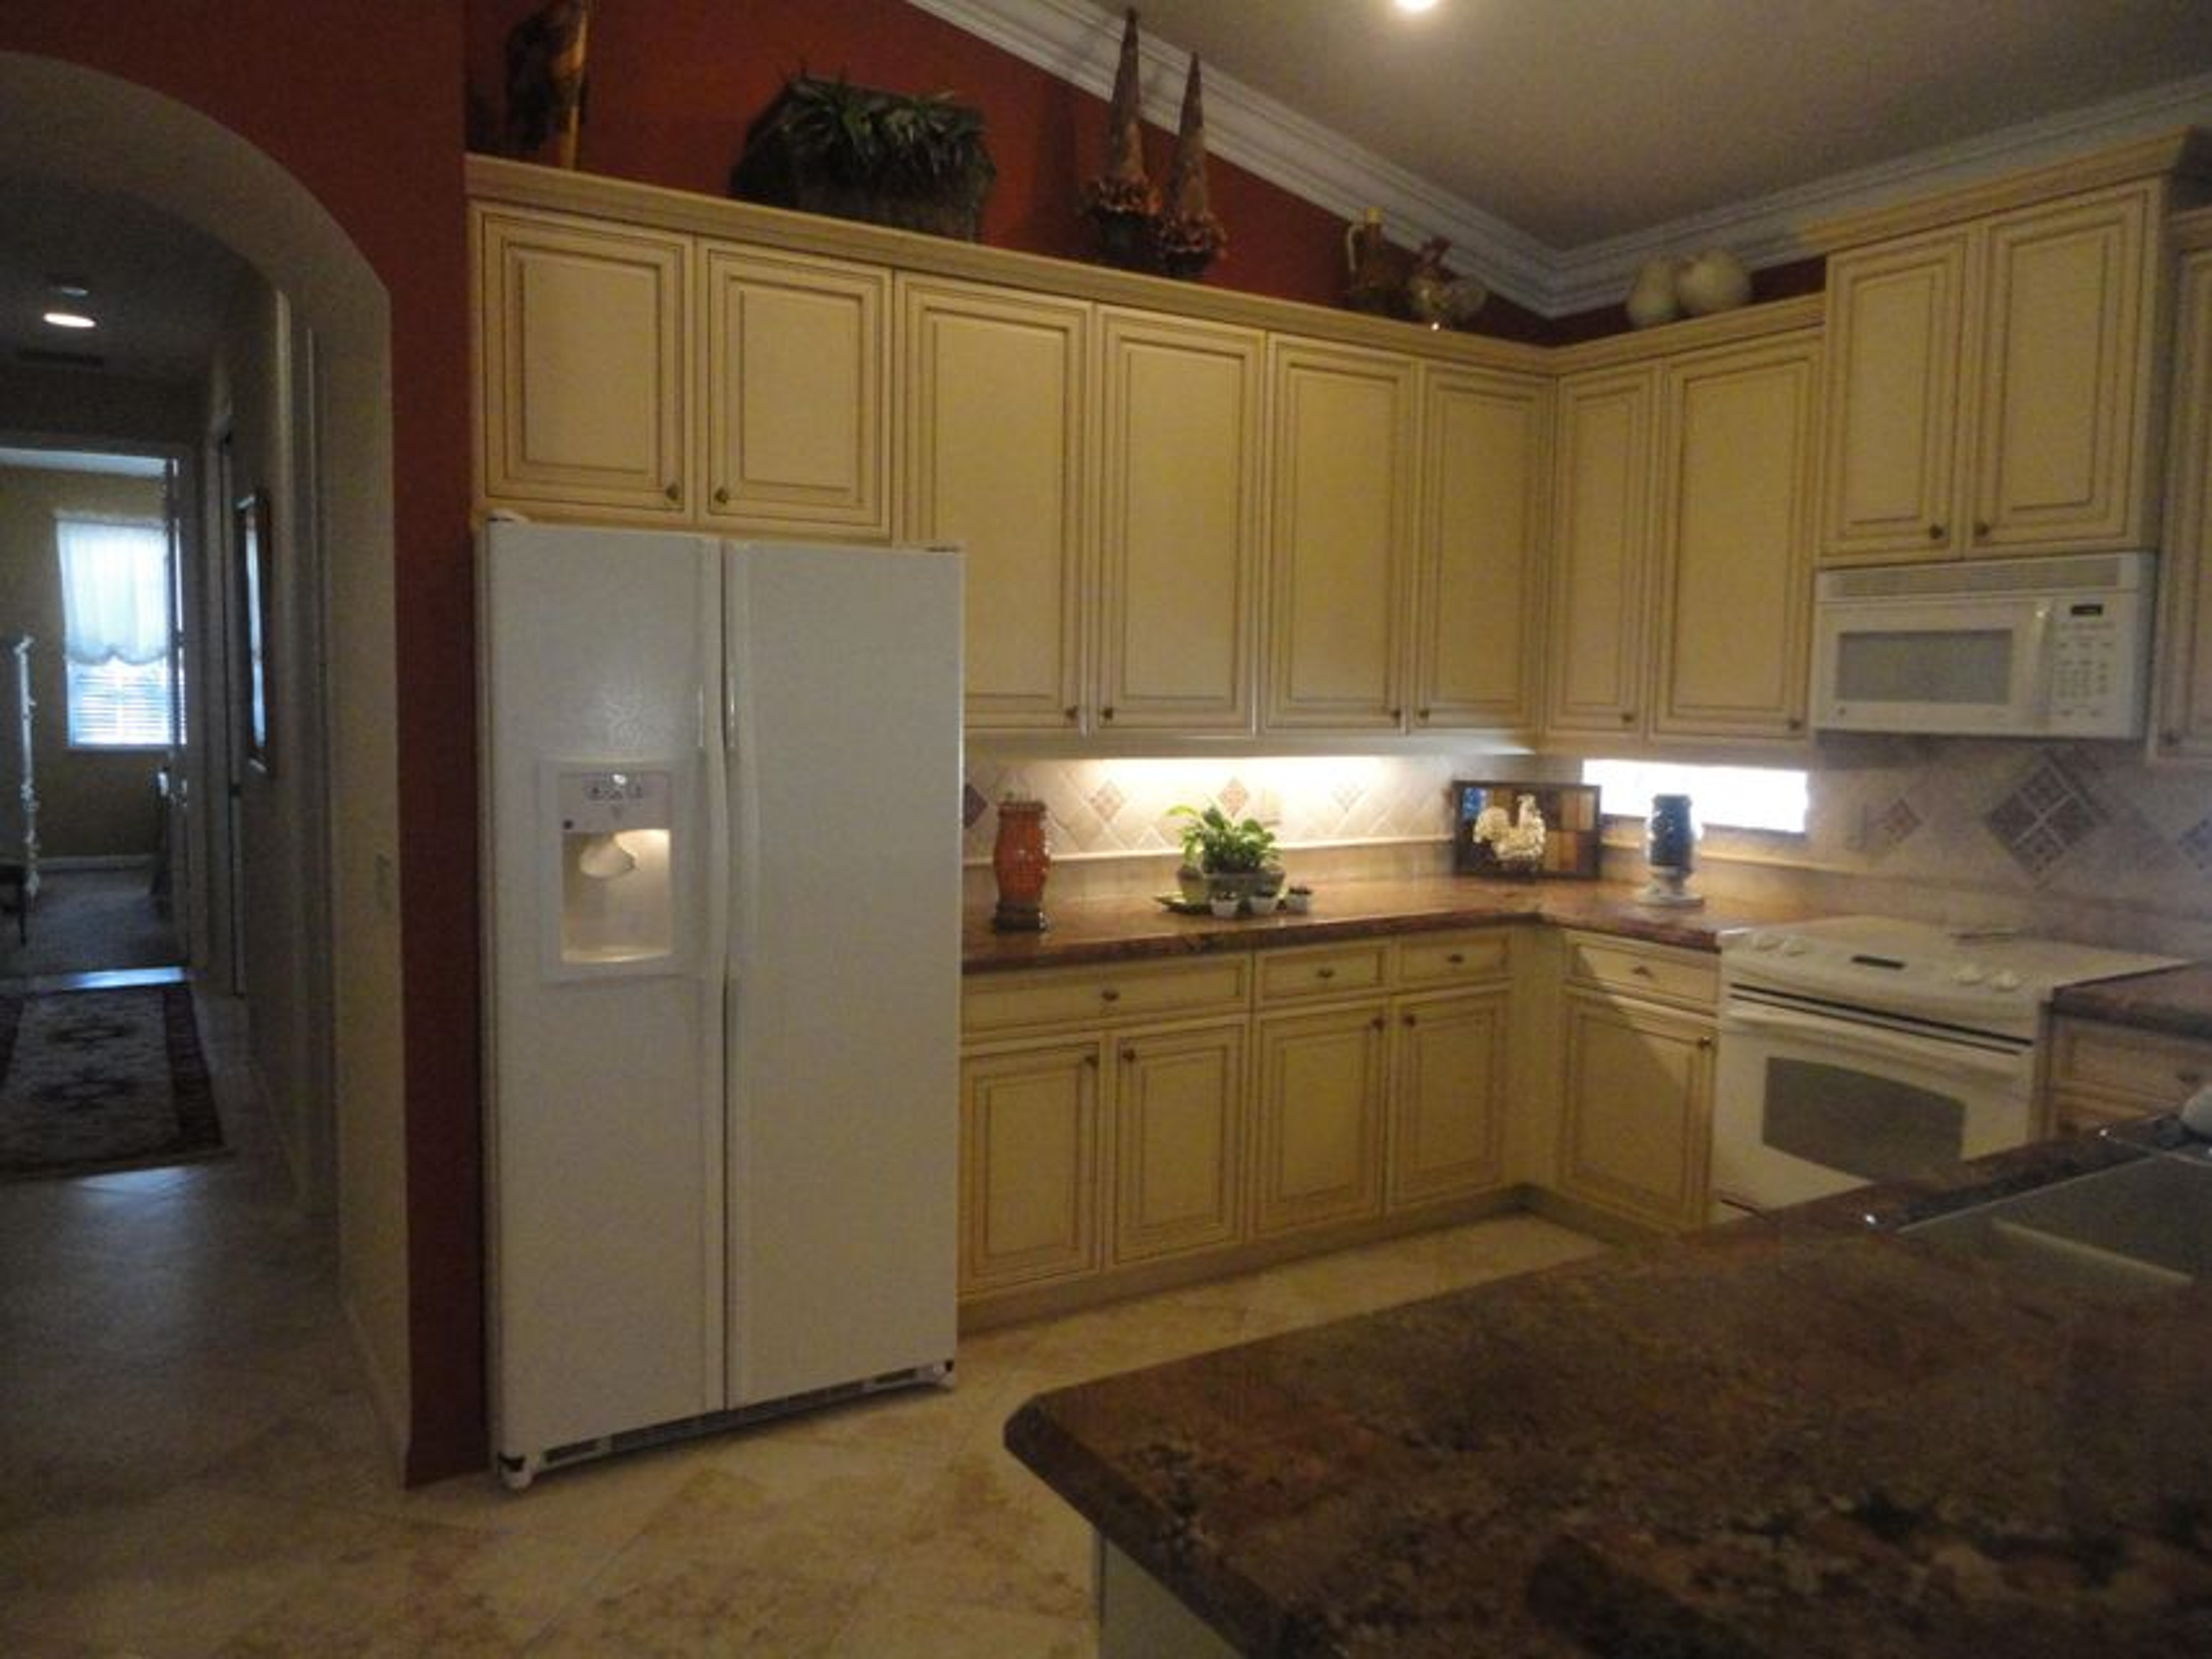 Additional photo for property listing at 7617 Lockhart Way 7617 Lockhart Way Boynton Beach, Florida 33437 Estados Unidos